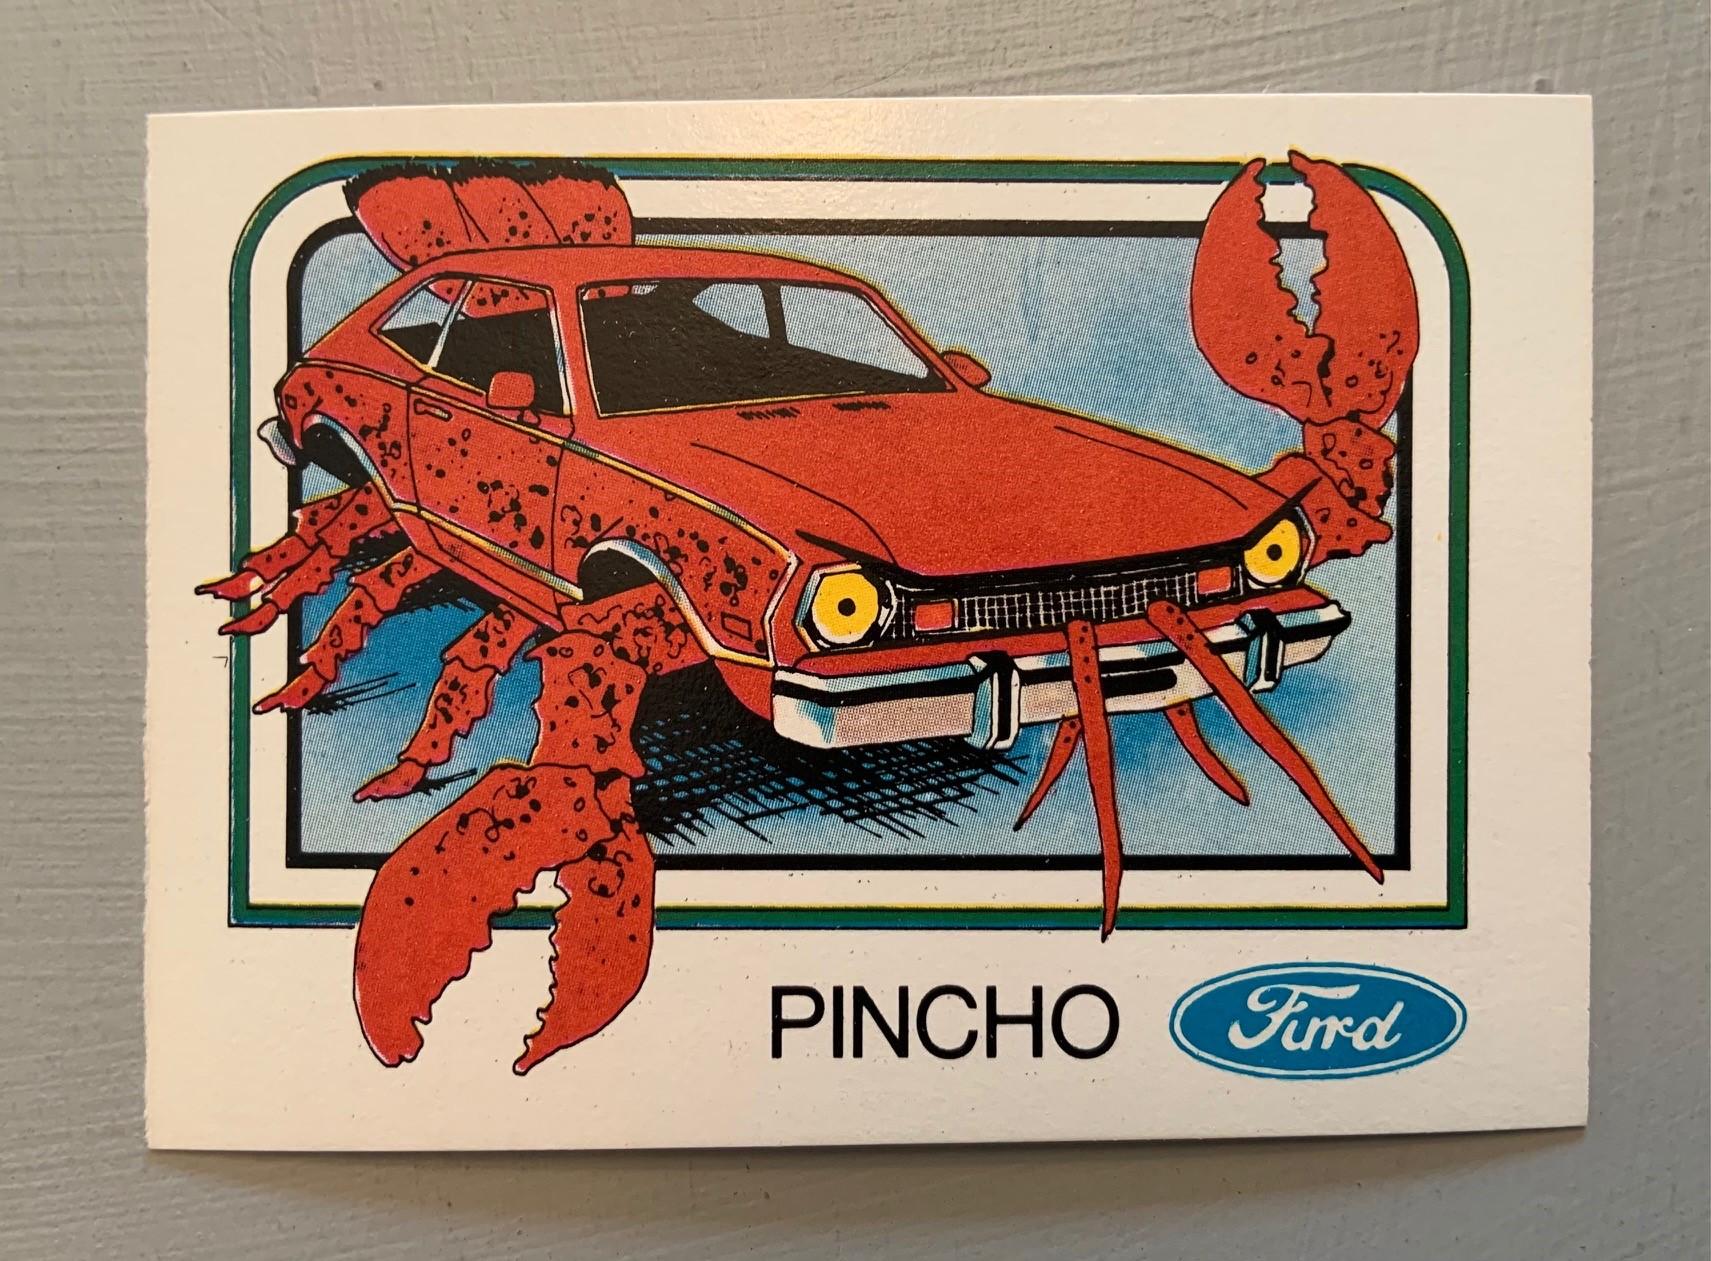 1976 Wonder Bread Krazy Cars - Pincho